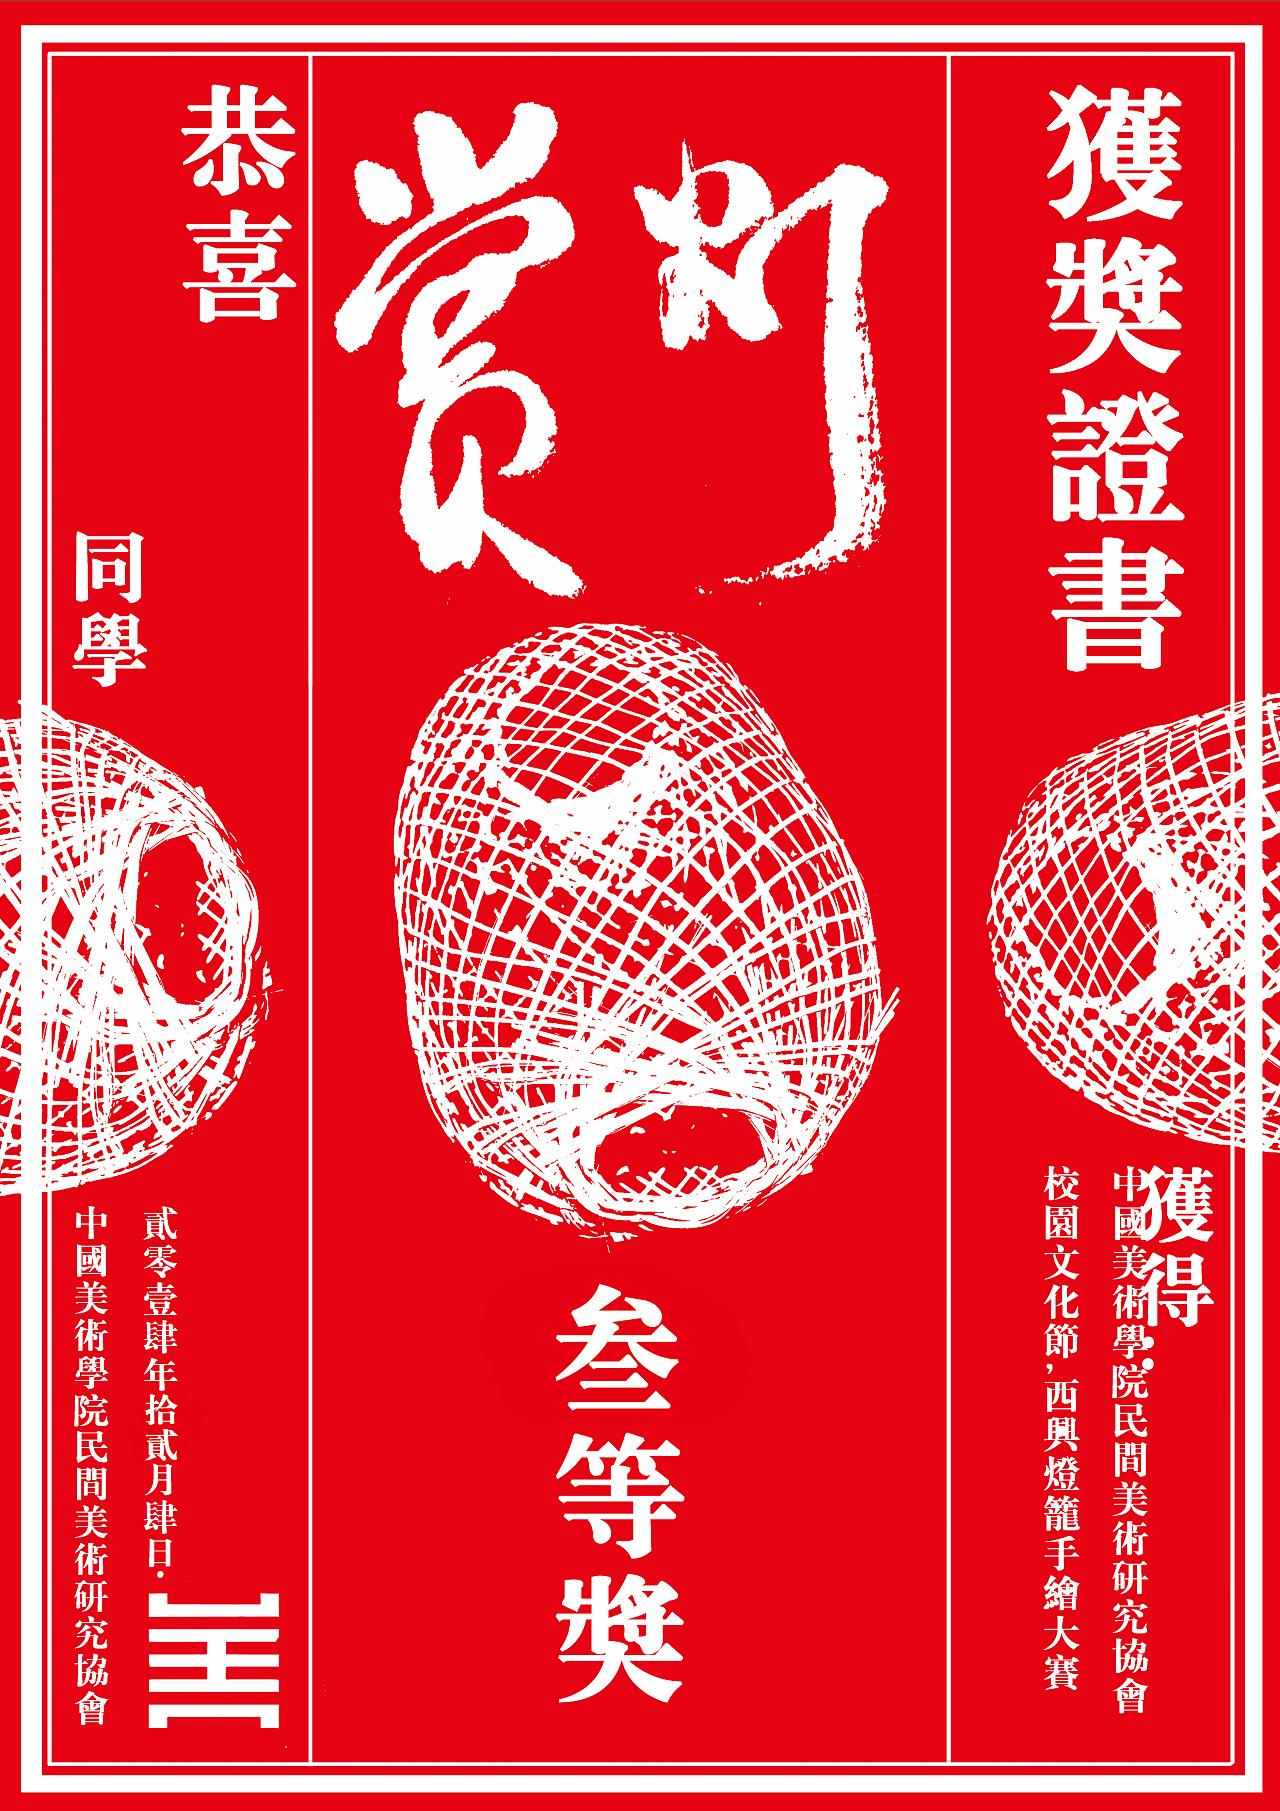 weixin qq com 中国 版 上/oCB